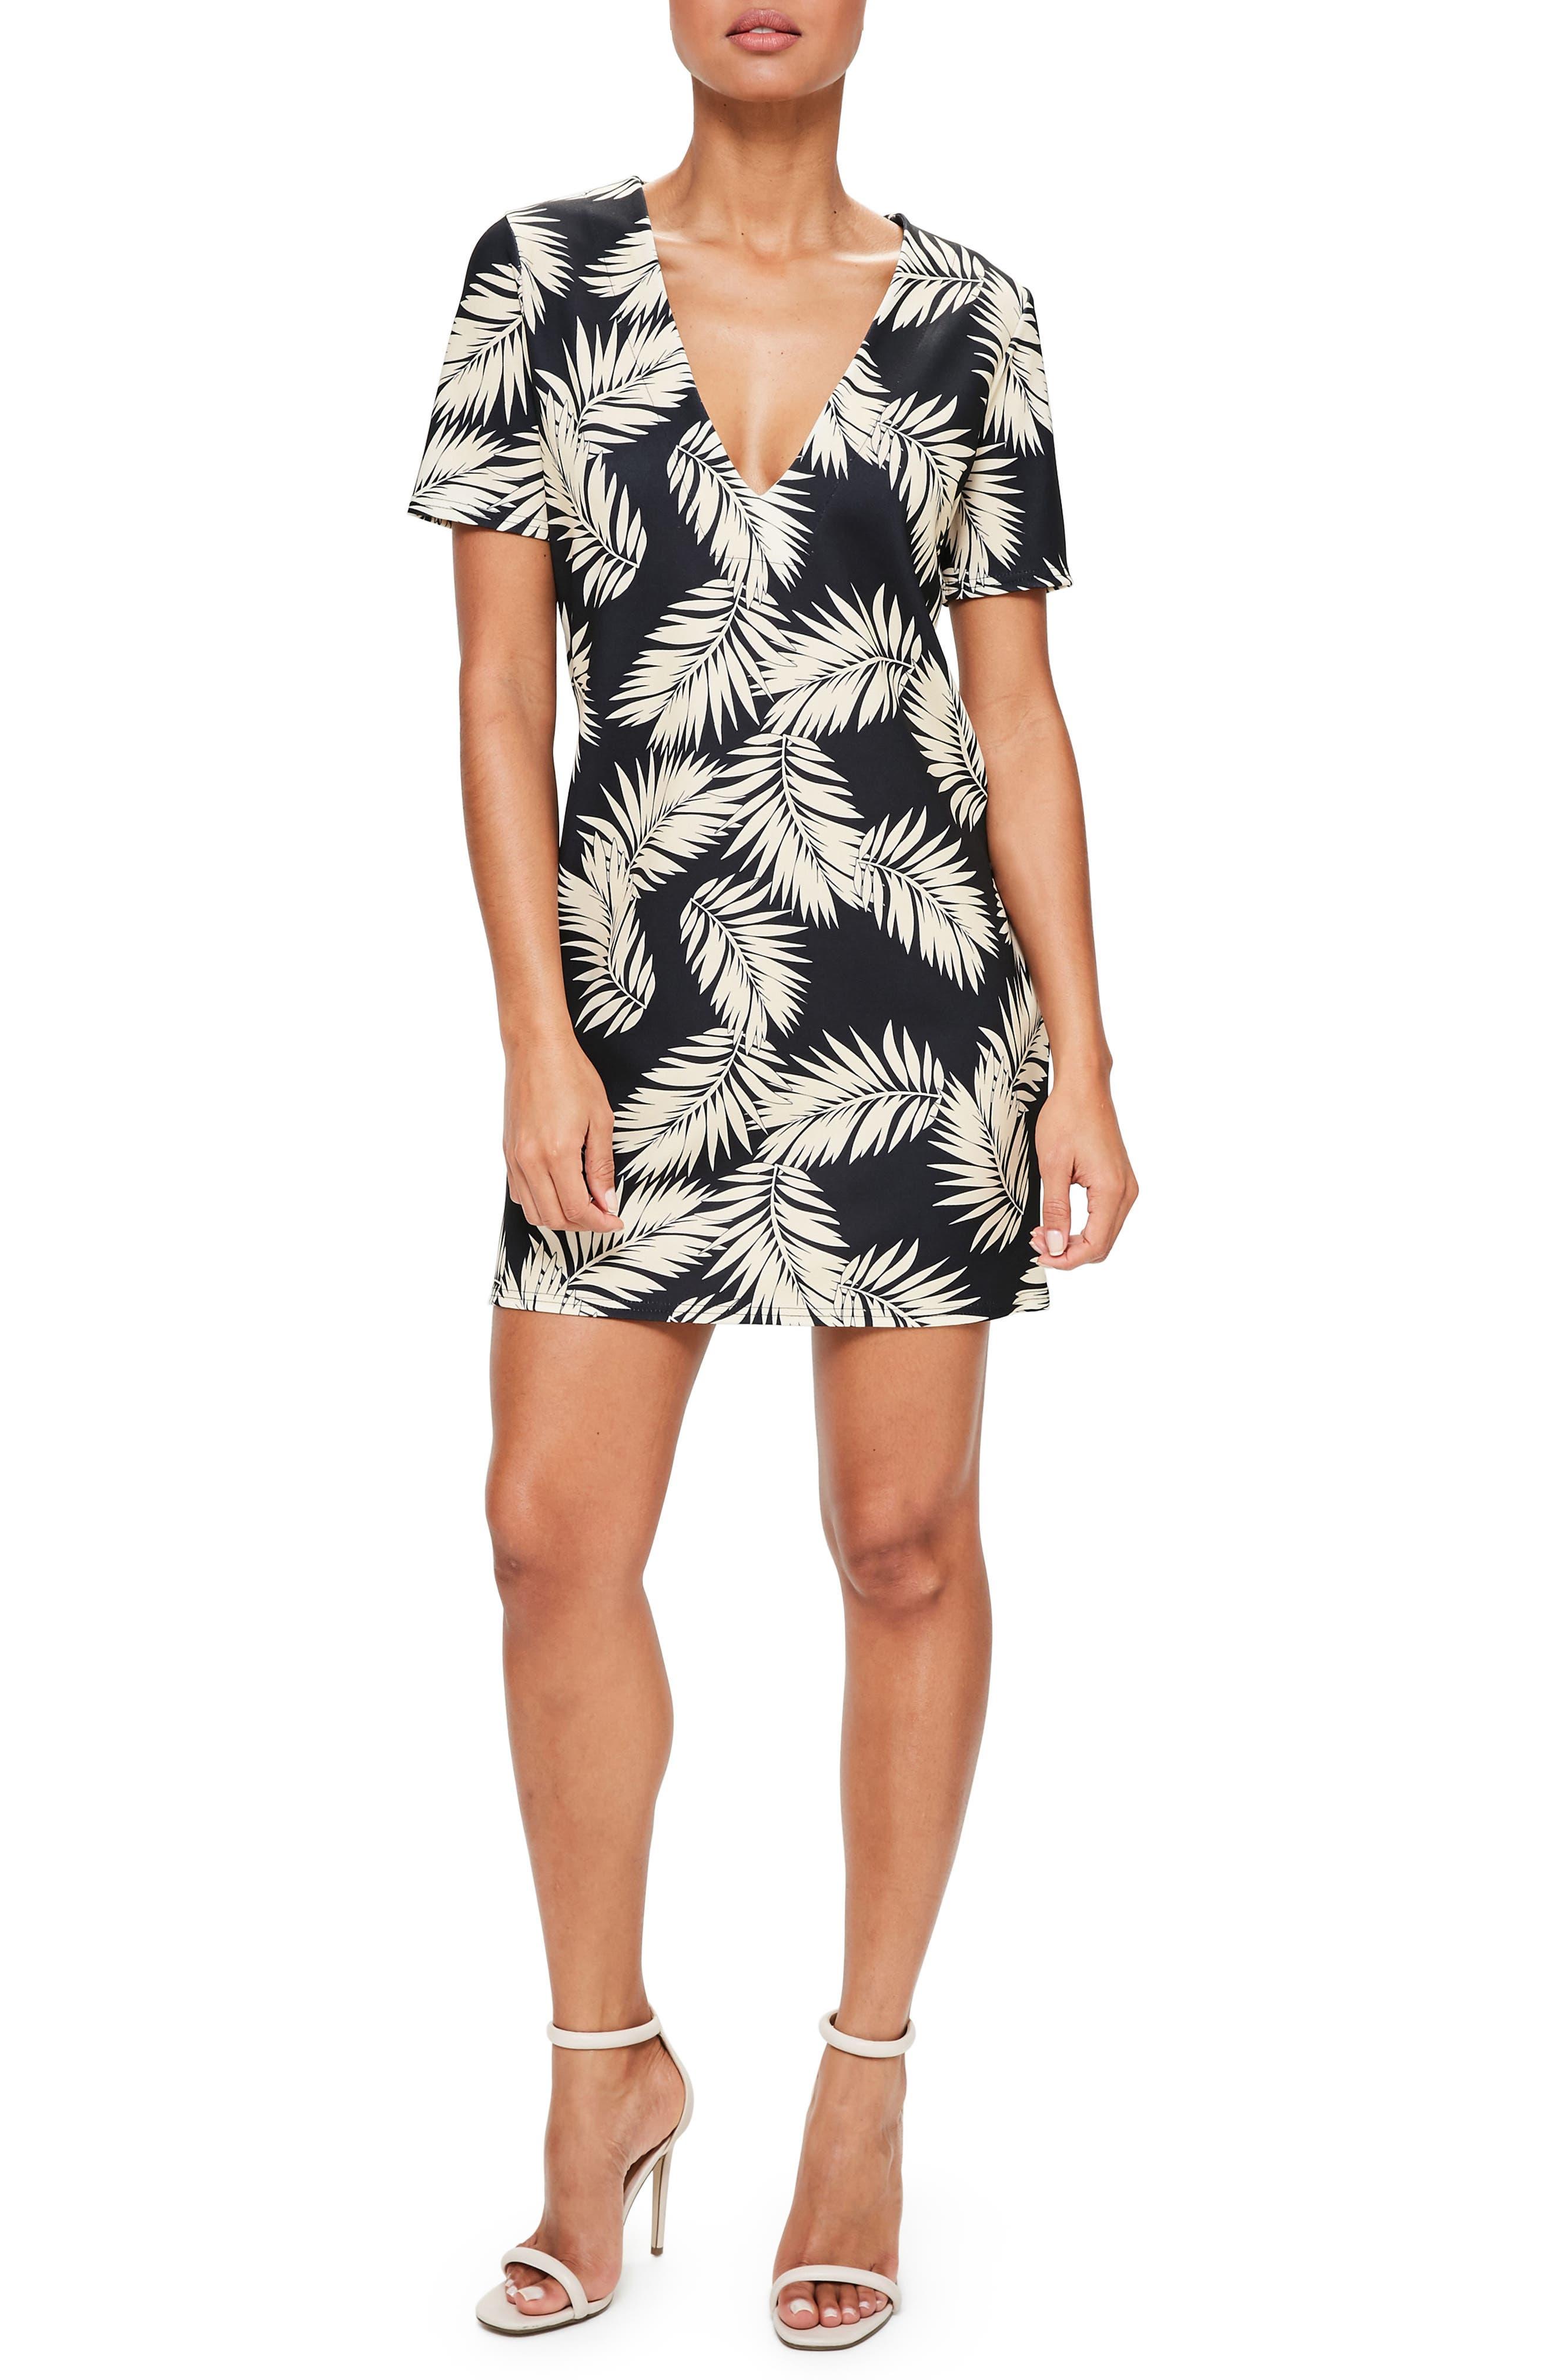 Main Image - Missguided Print Plunge T-Shirt Dress